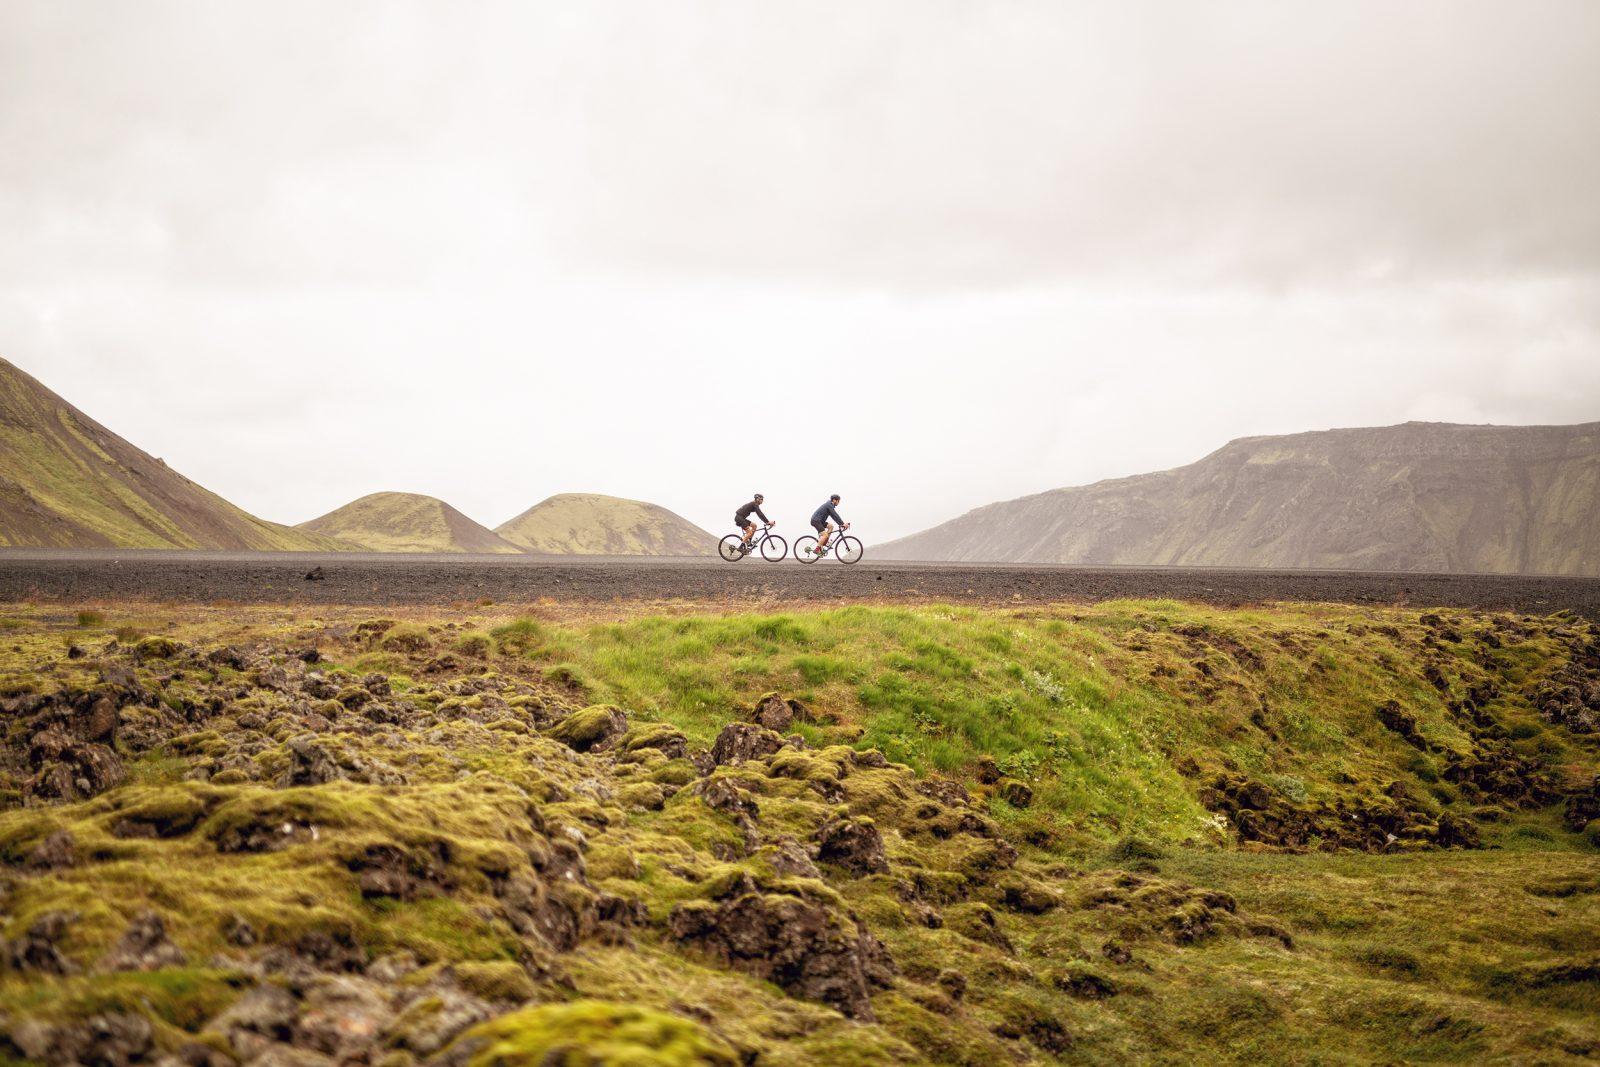 Marin Iceland 2019 Headlands 2